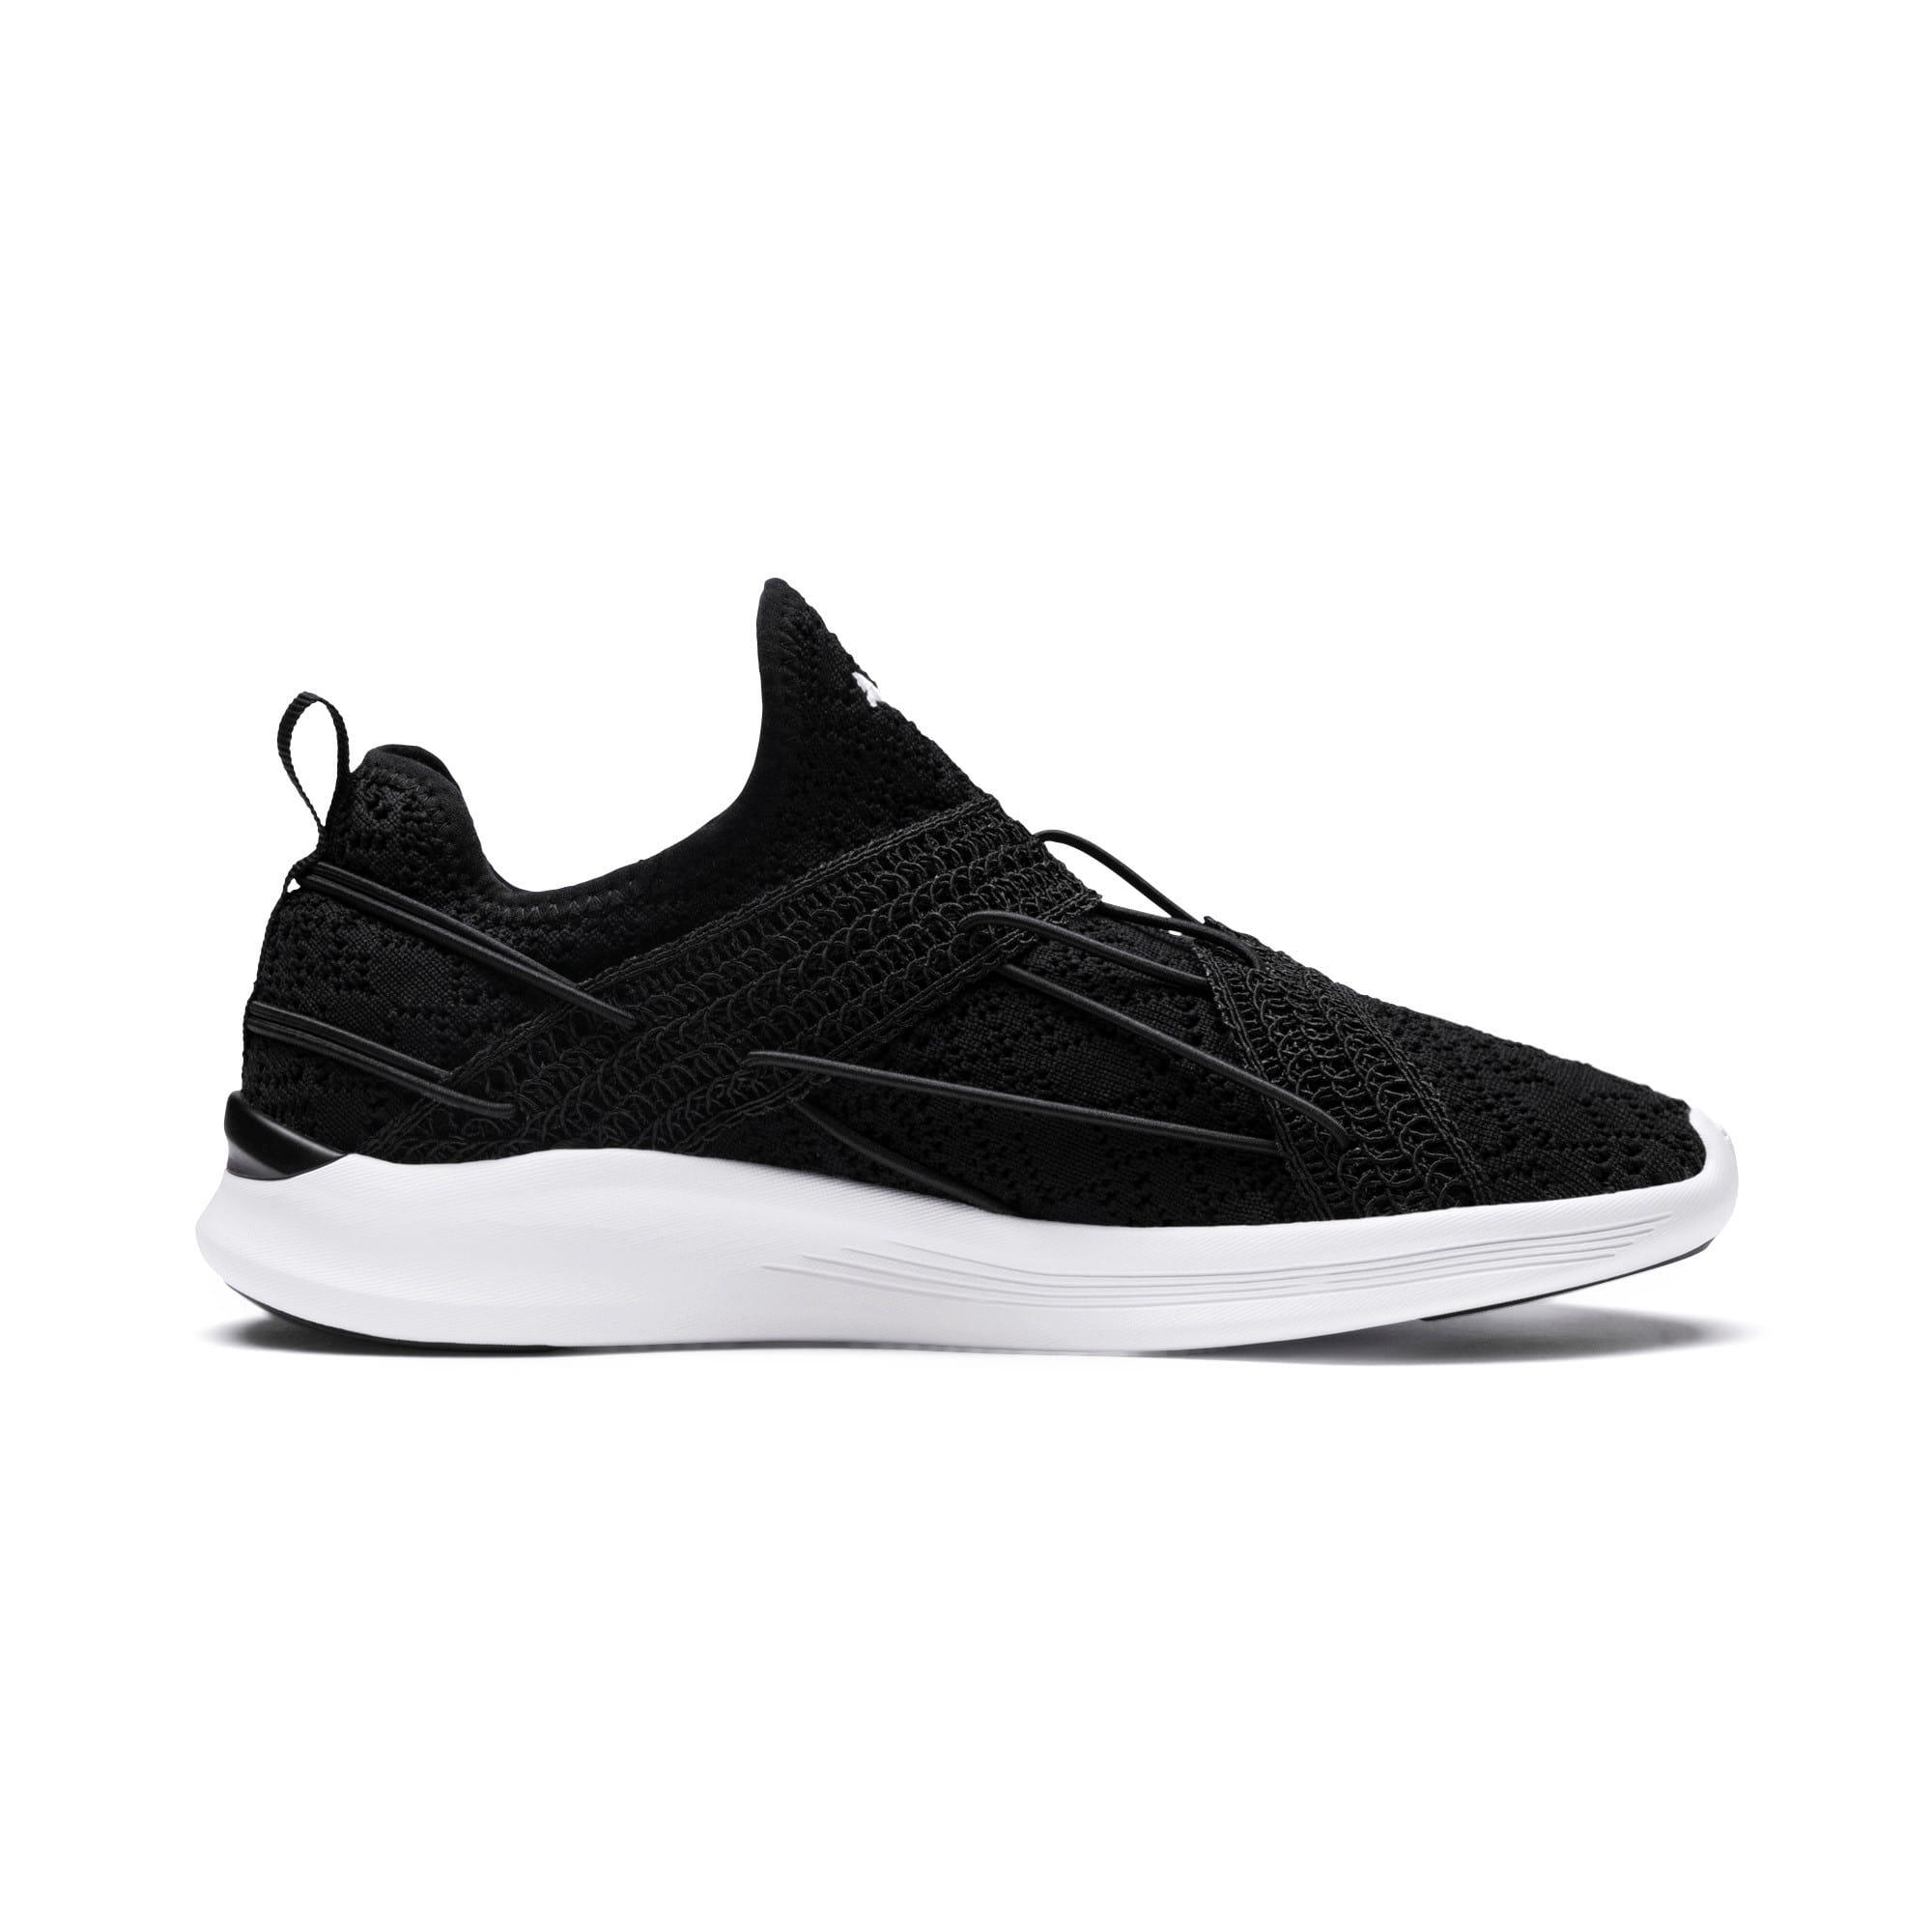 Thumbnail 5 of IGNITE Flash Sensua Women's Running Shoes, Puma Black-Puma White, medium